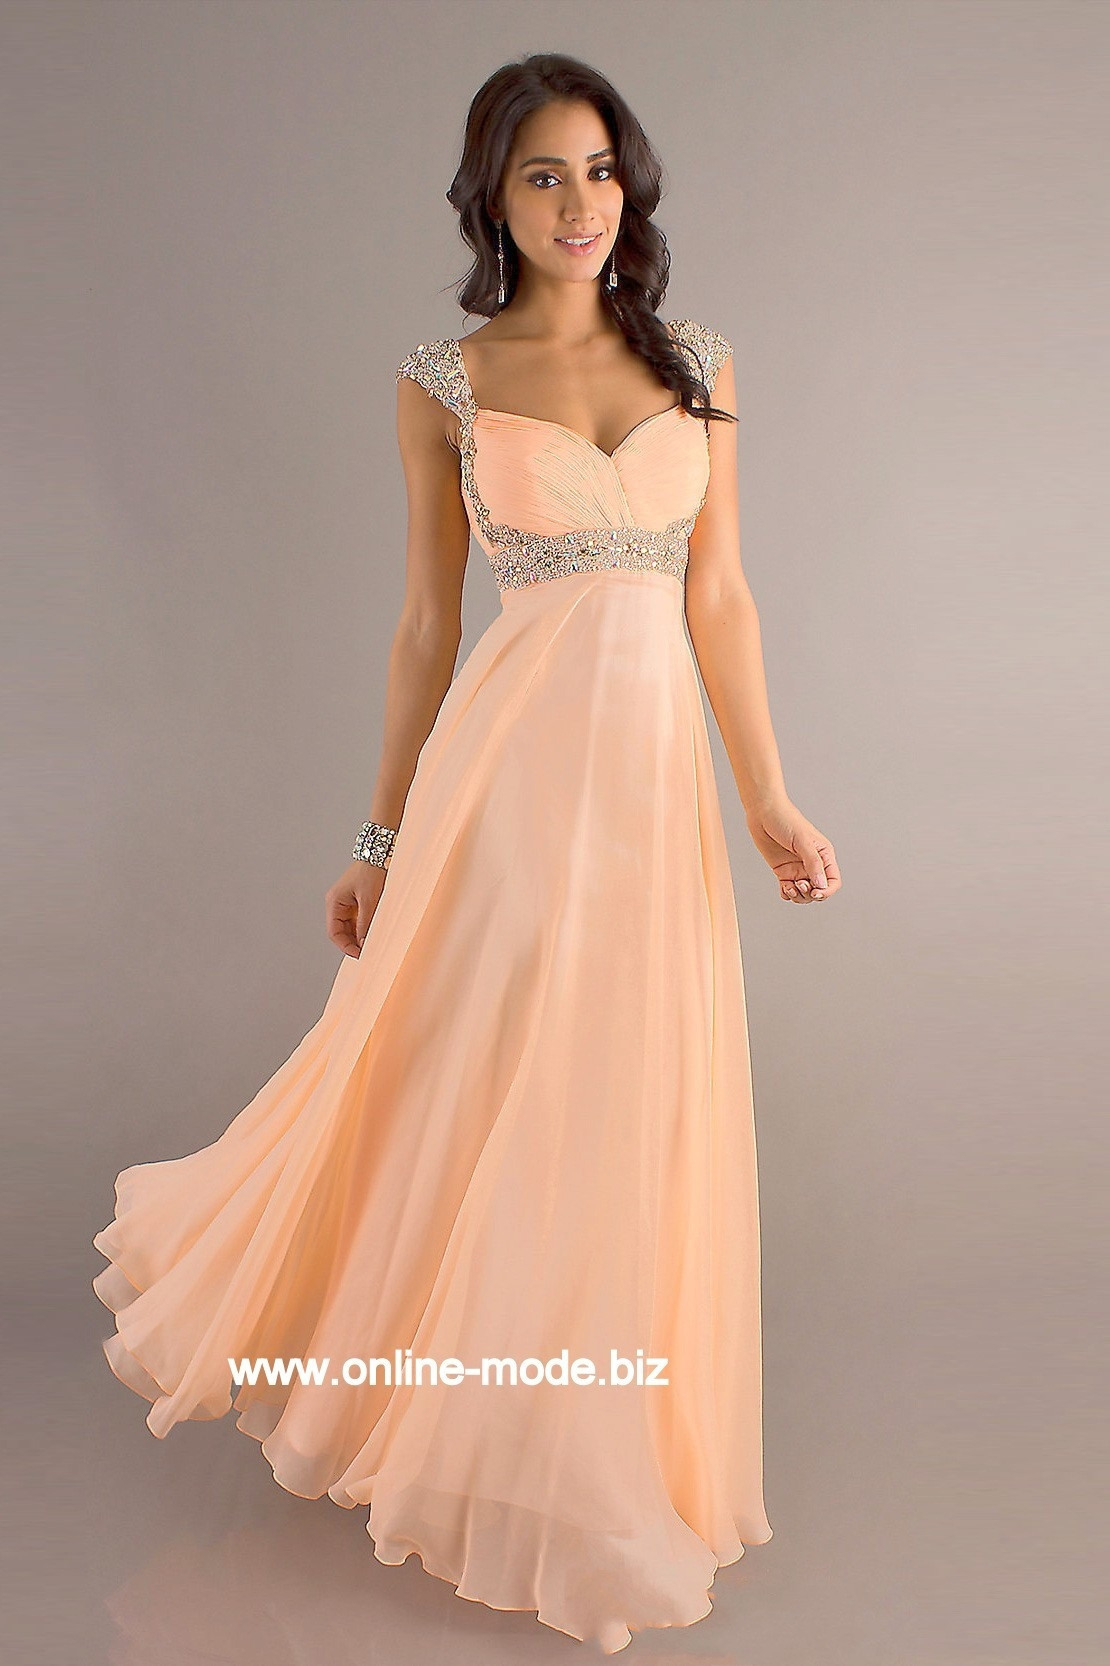 Formal Elegant Abendkleider Zalando Design - Abendkleid